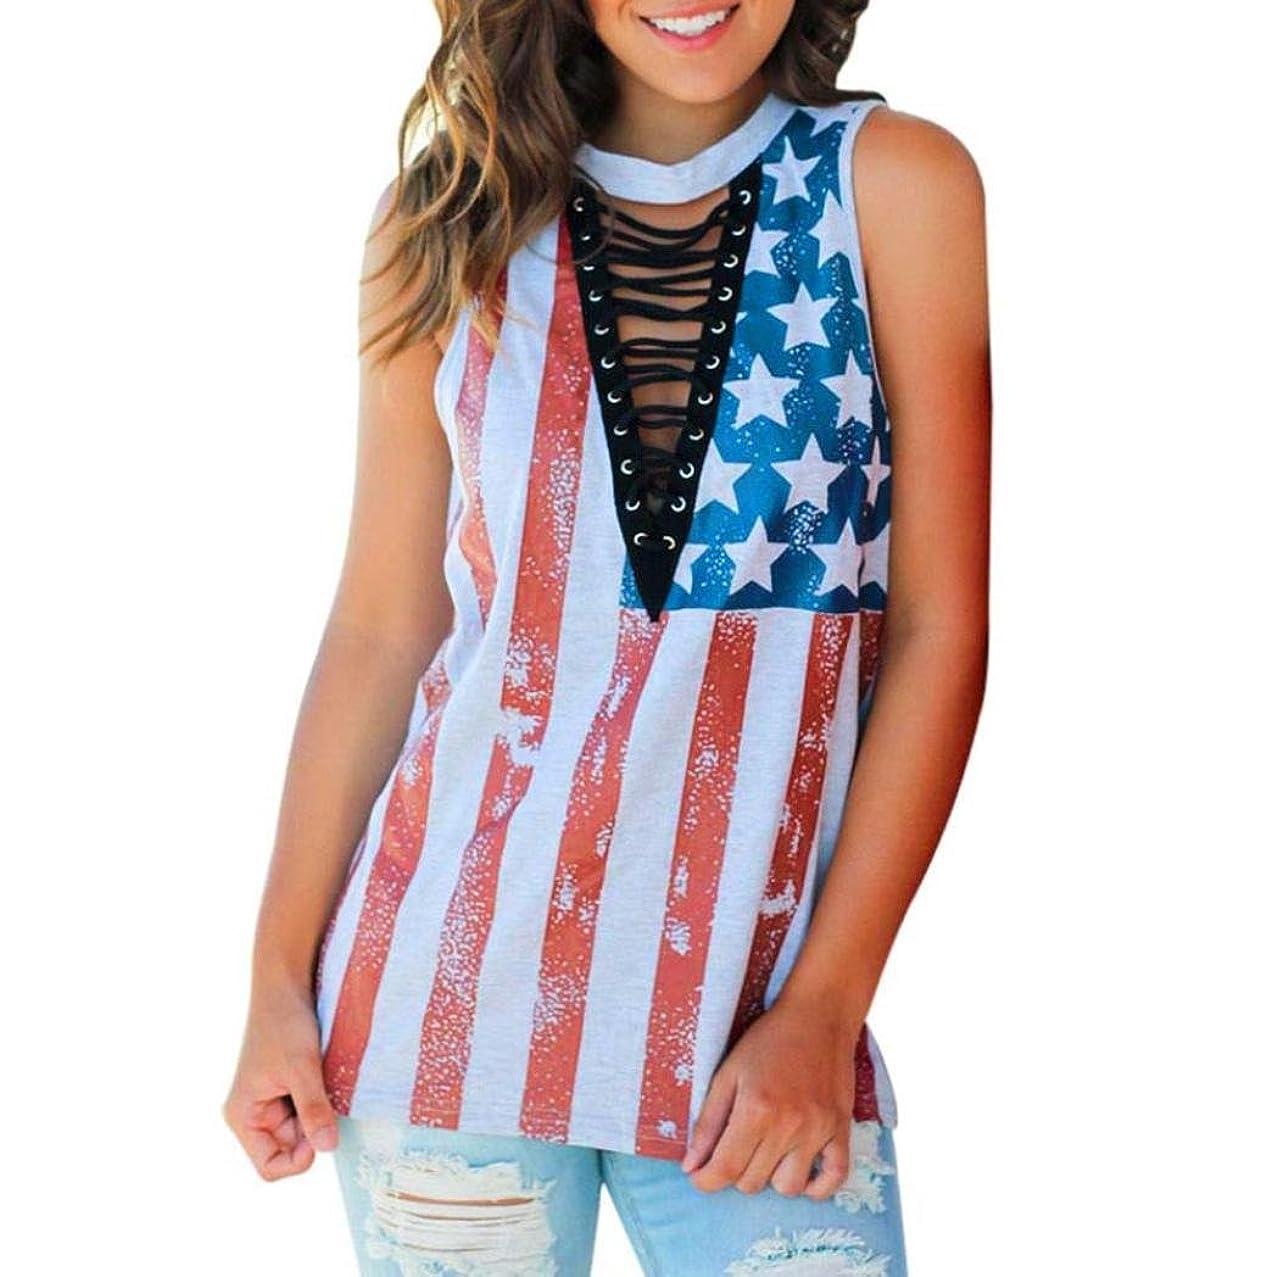 GBSELL Women Rock American Flag Print Sleeveless Tank Crop Tops Blouse Shirt